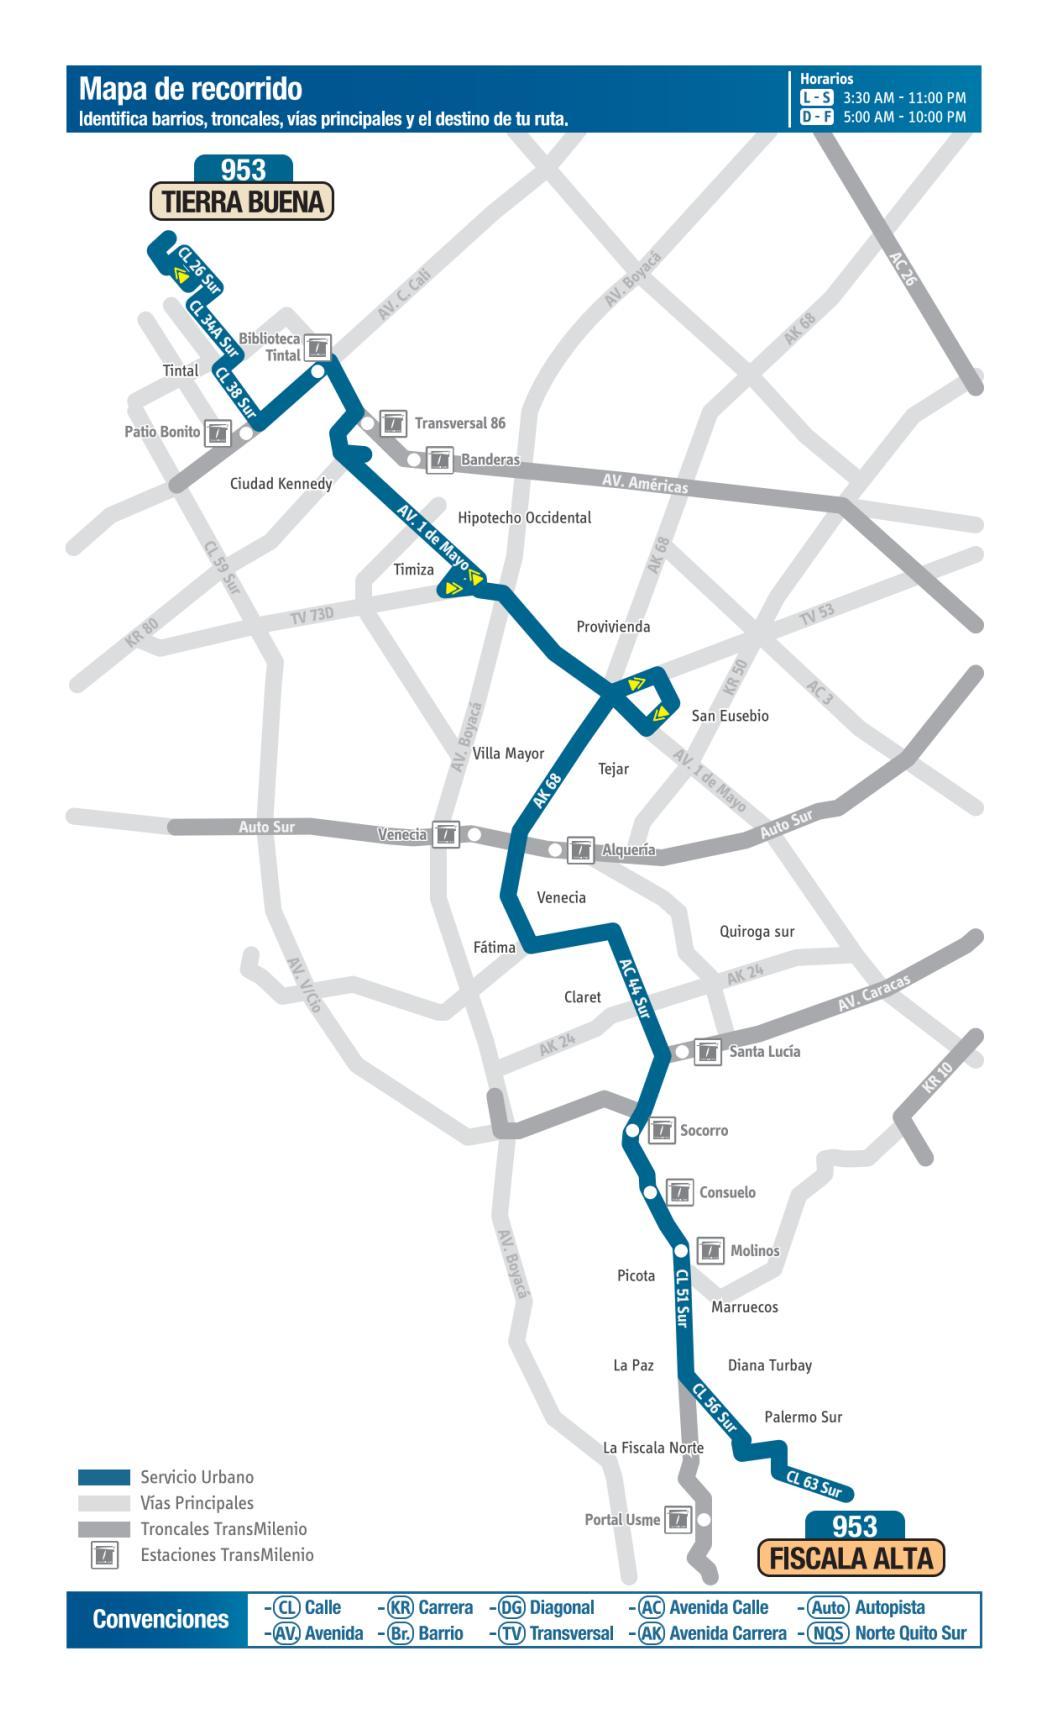 953 Tierra Buena - Fiscala Alta, mapa bus urbano Bogotá